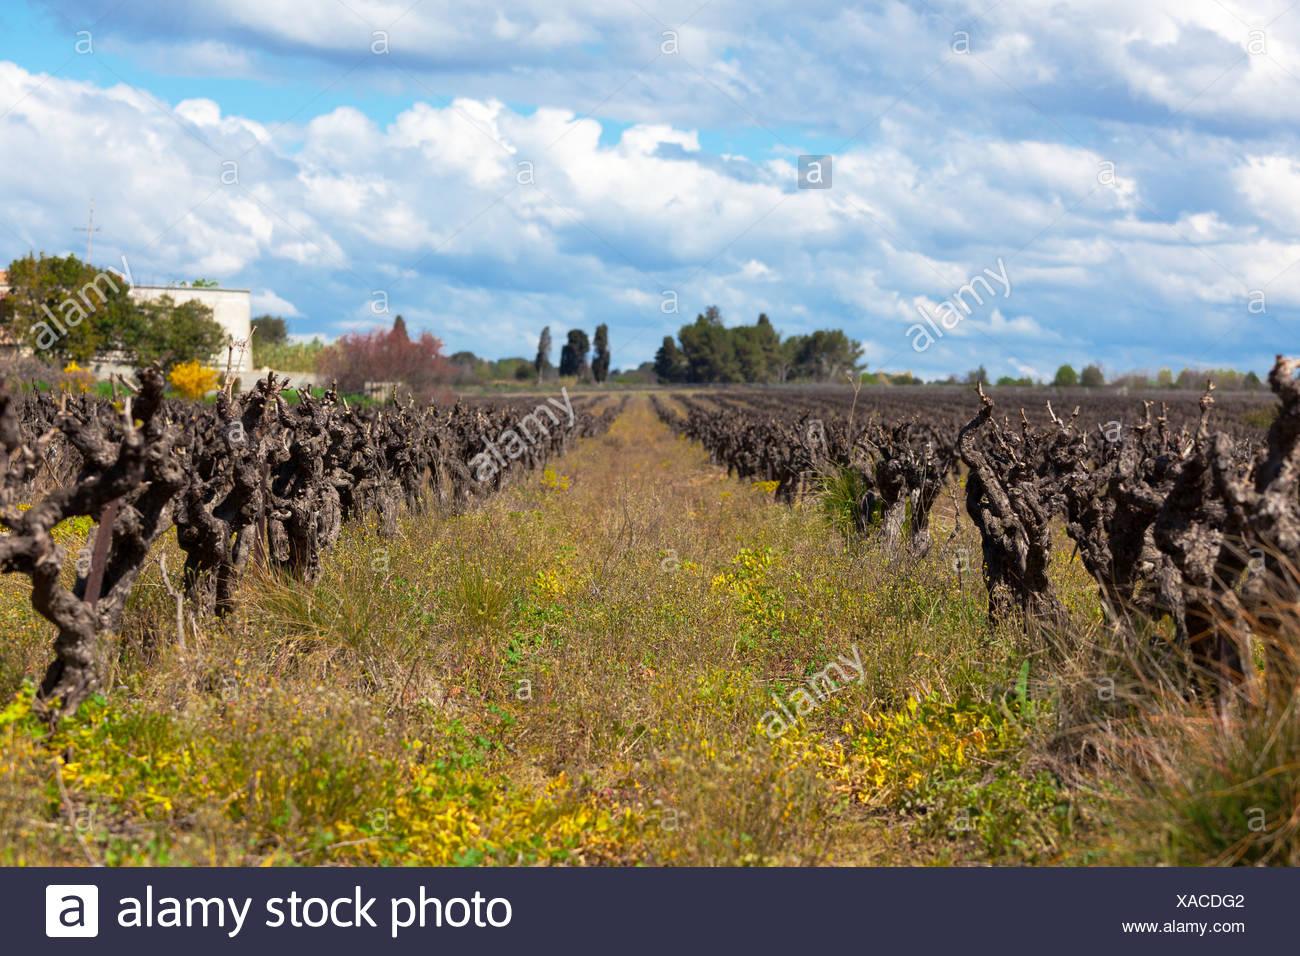 old grape vine - Stock Image